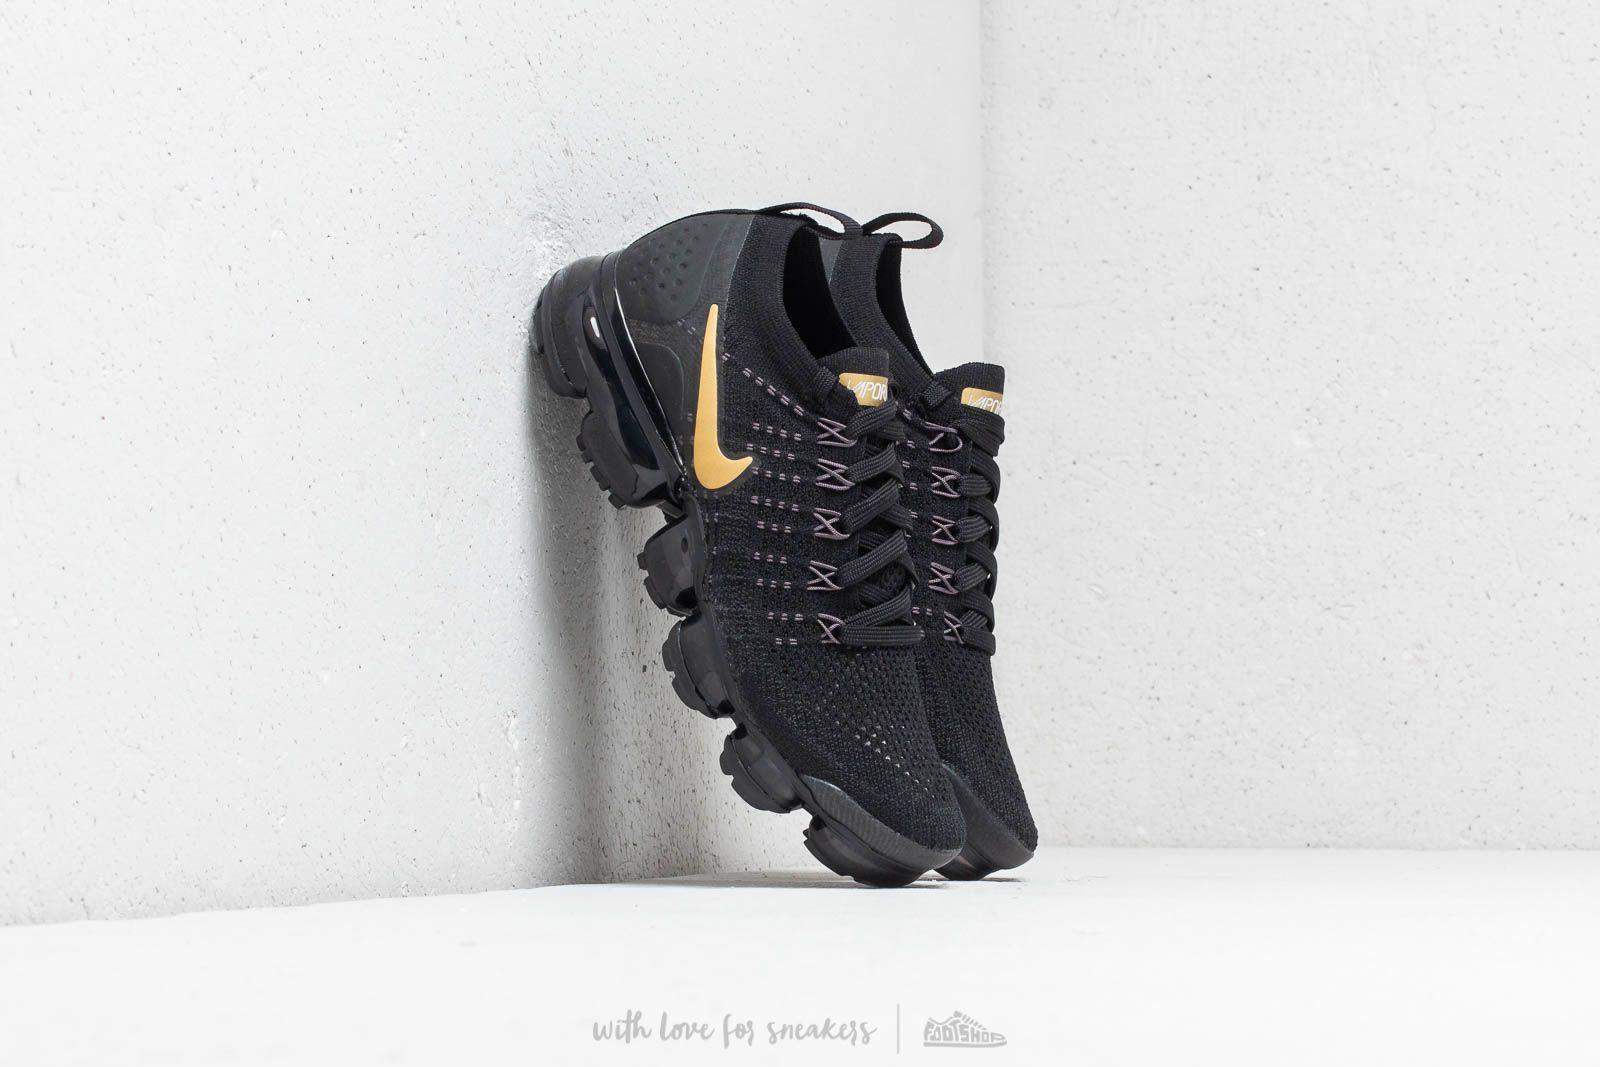 dba5ca143a5 Nike Air Vapormax Flyknit 2 W Black  Metallic Gold at a great price £181